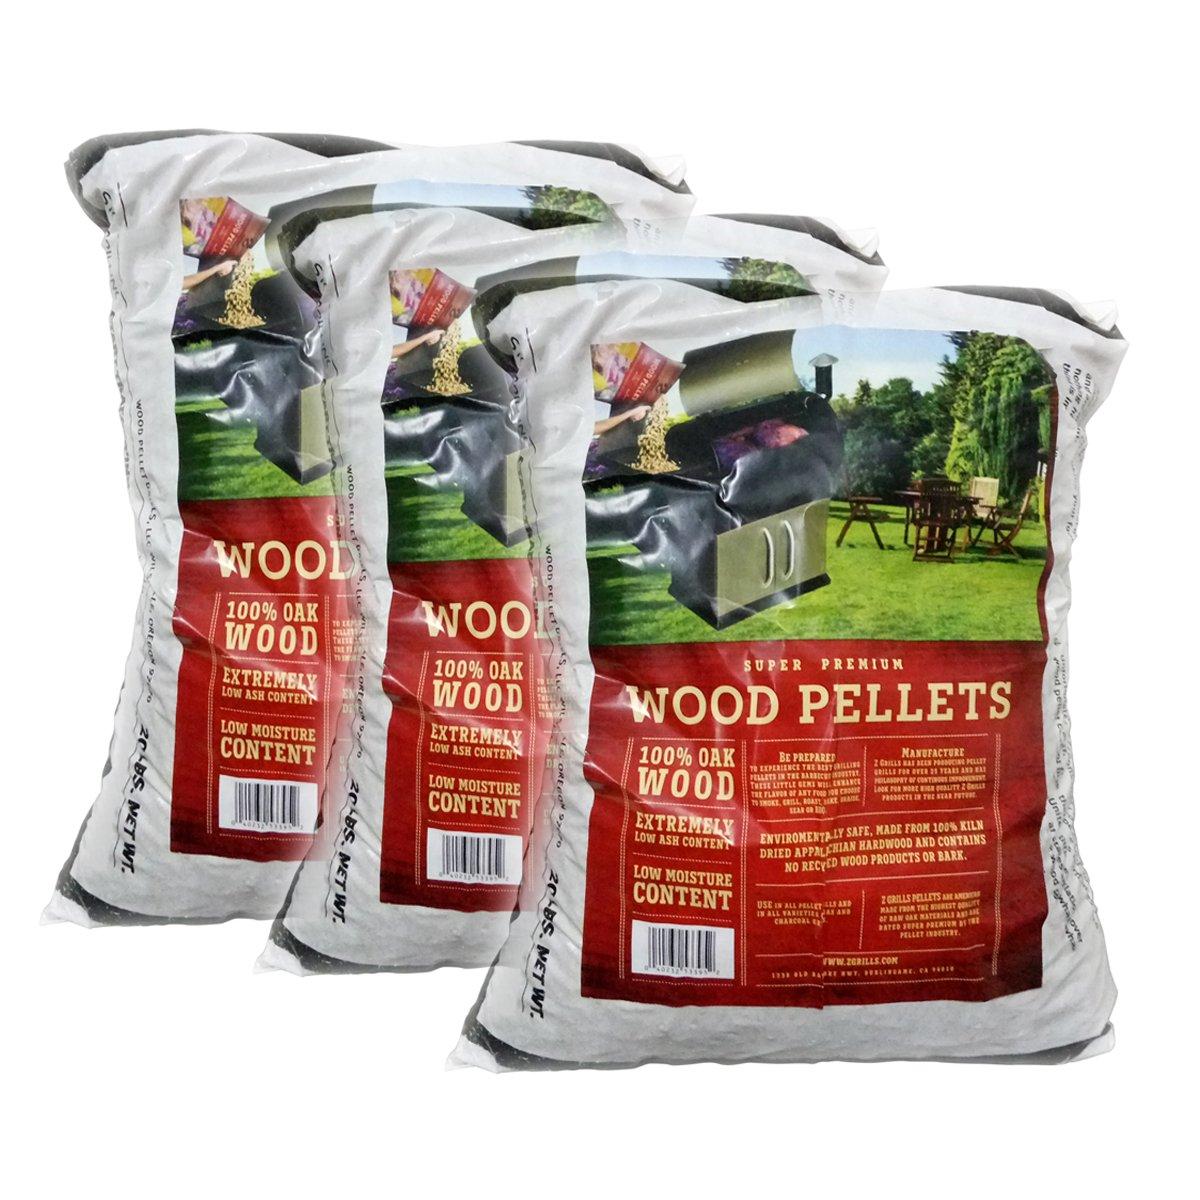 Z GRILLS Premium BBQ Wood Pellets Grilling Smoking Cooking Oak Hardwood Pellets,20LB Per Bag Made in USA (3) by Z GRILLS